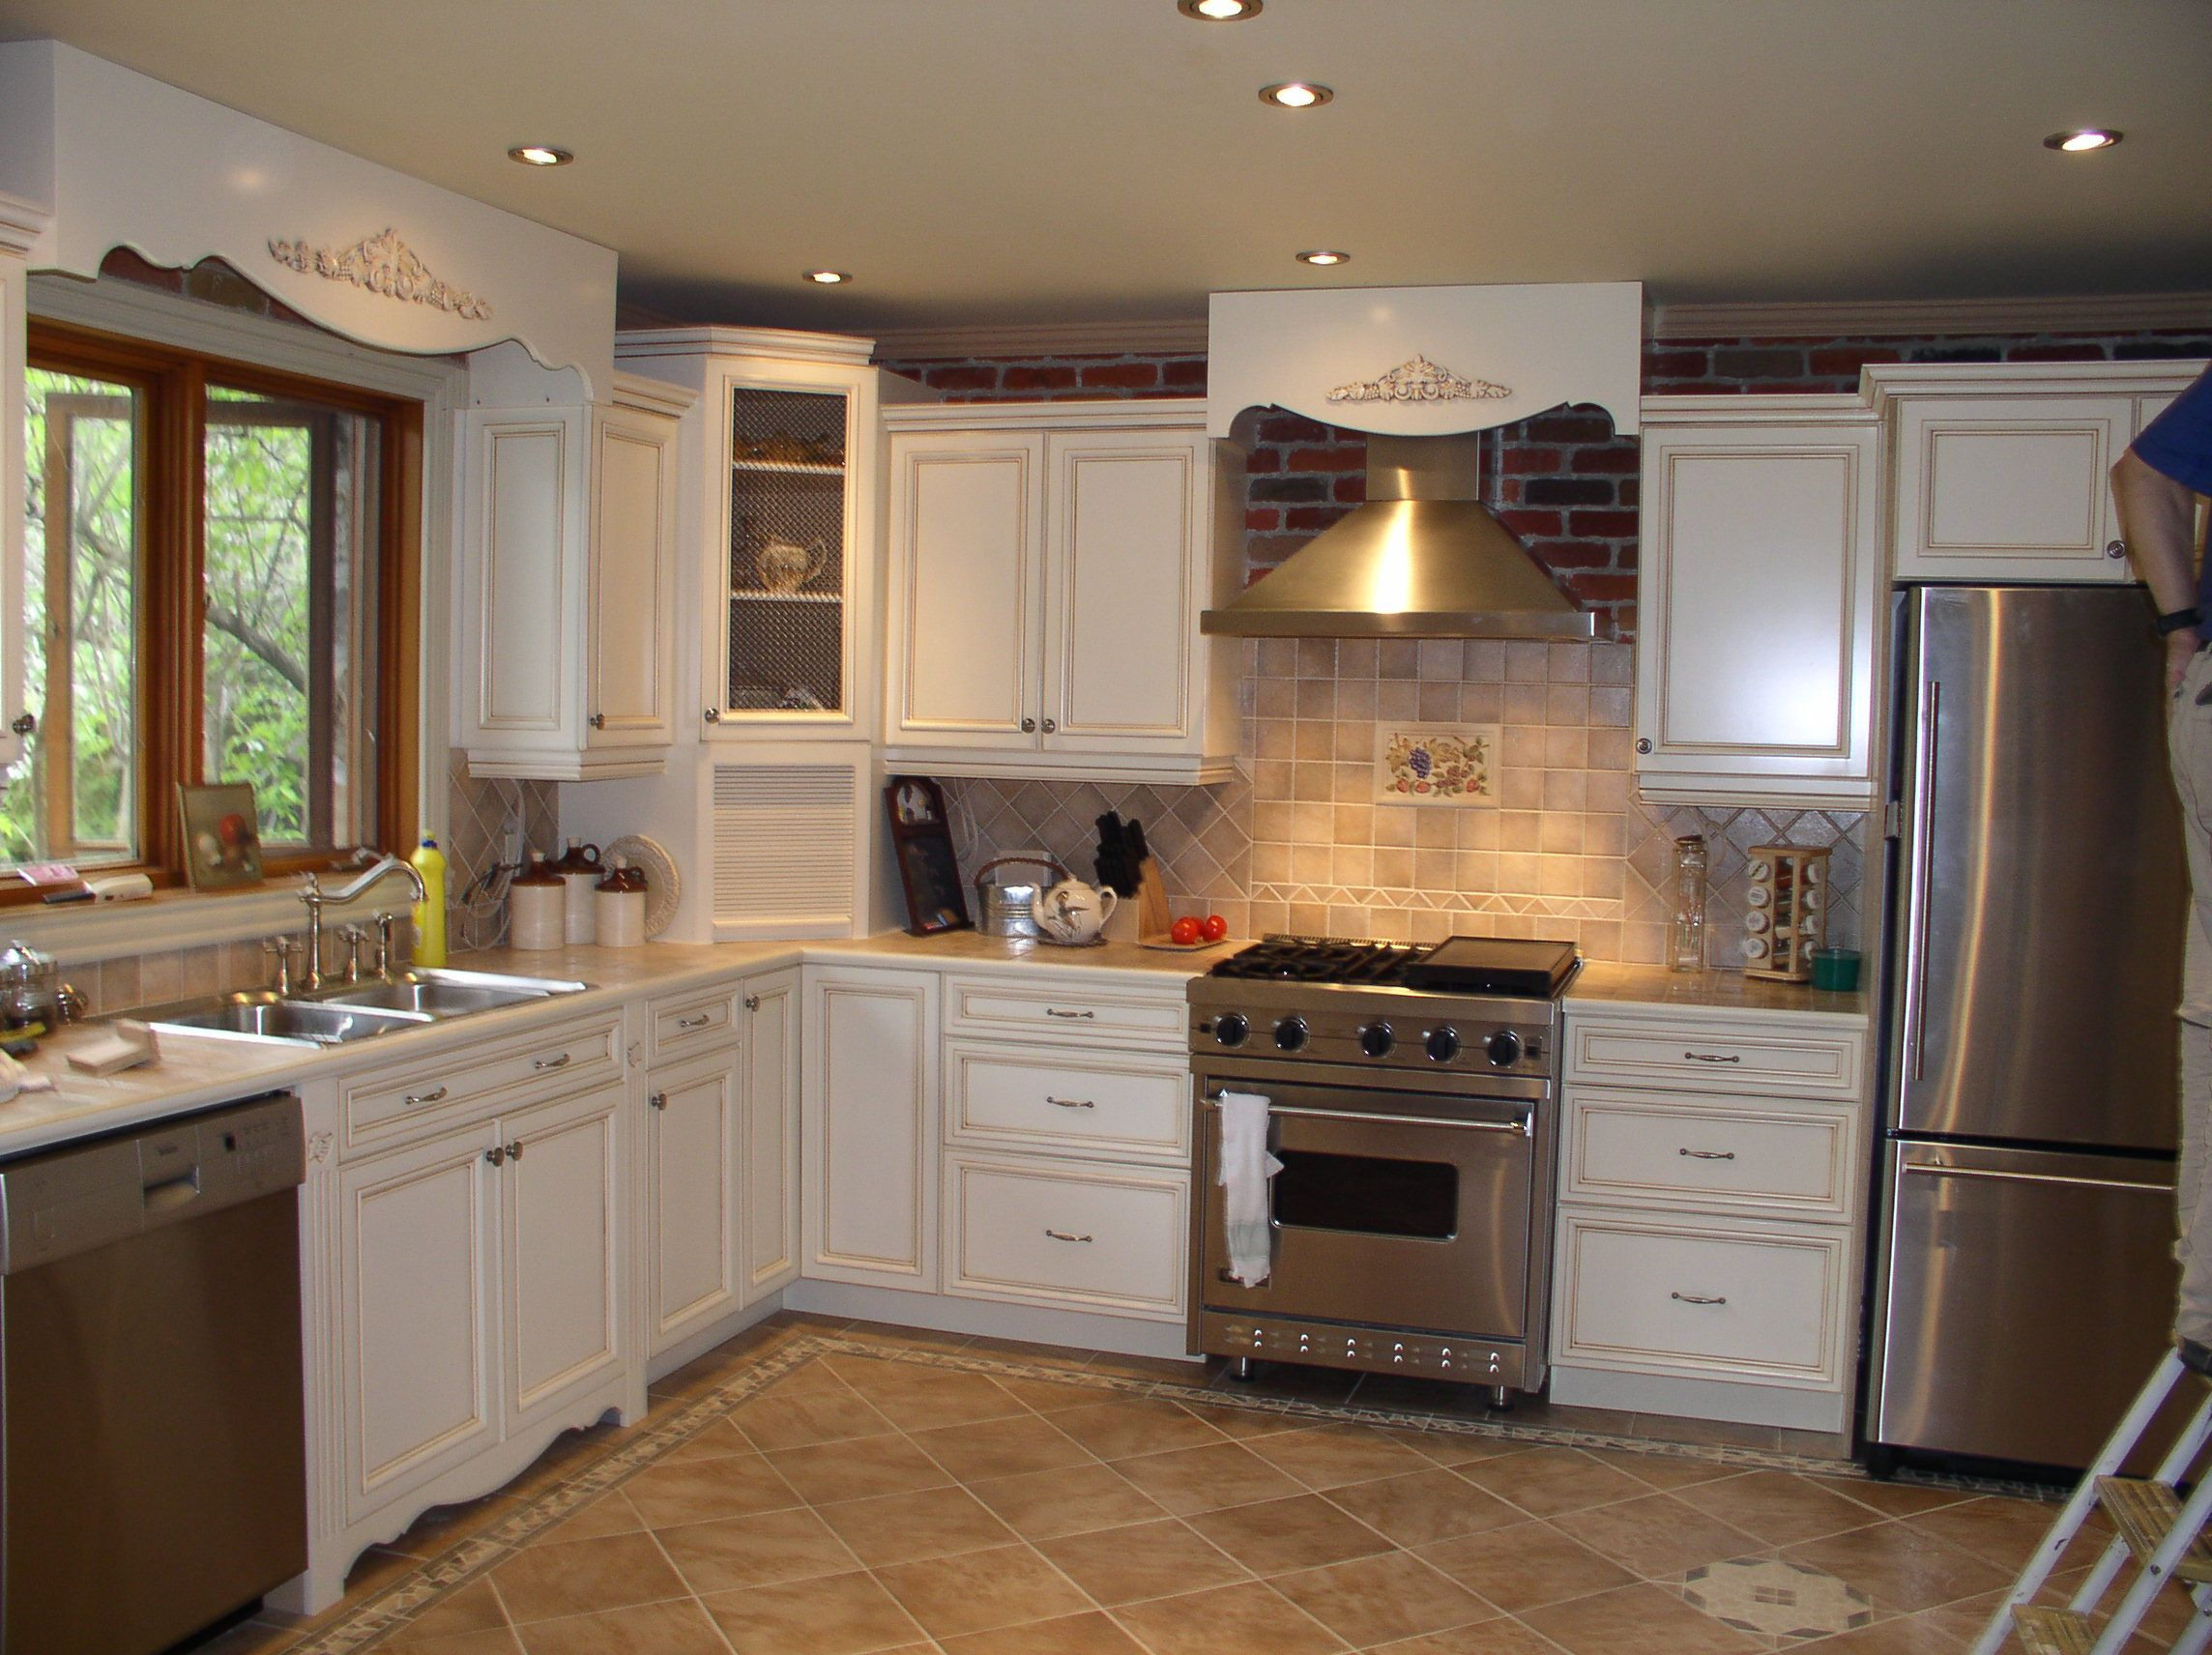 Small Kitchen Design Ideas Gallery